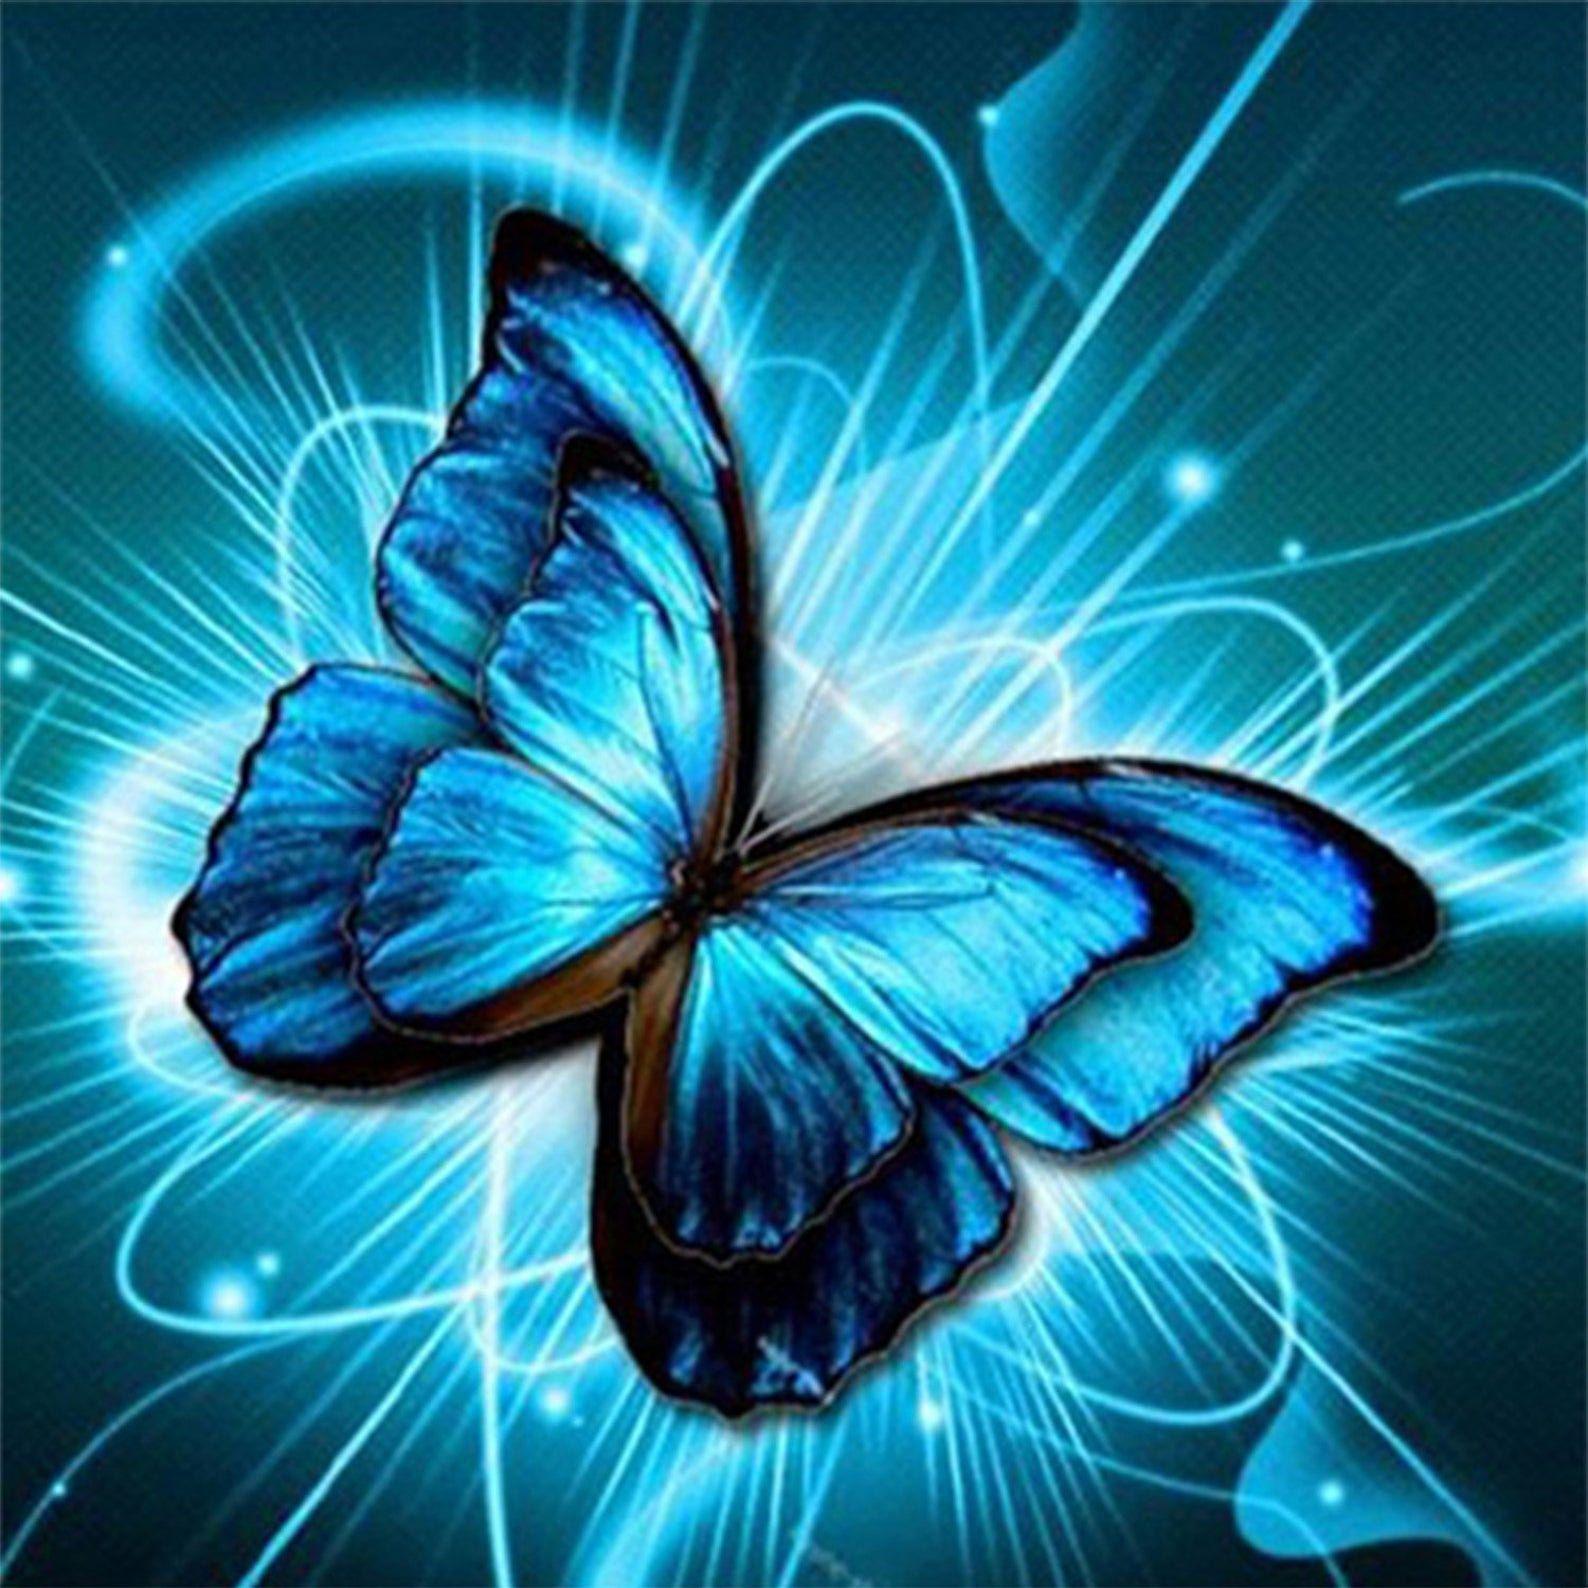 Beautiful Blue Butterfly 5D Diamond Painting Kit Embroidery Cross Stitch Rhinestone Mosaic Painting Home Decor Christmas Gift